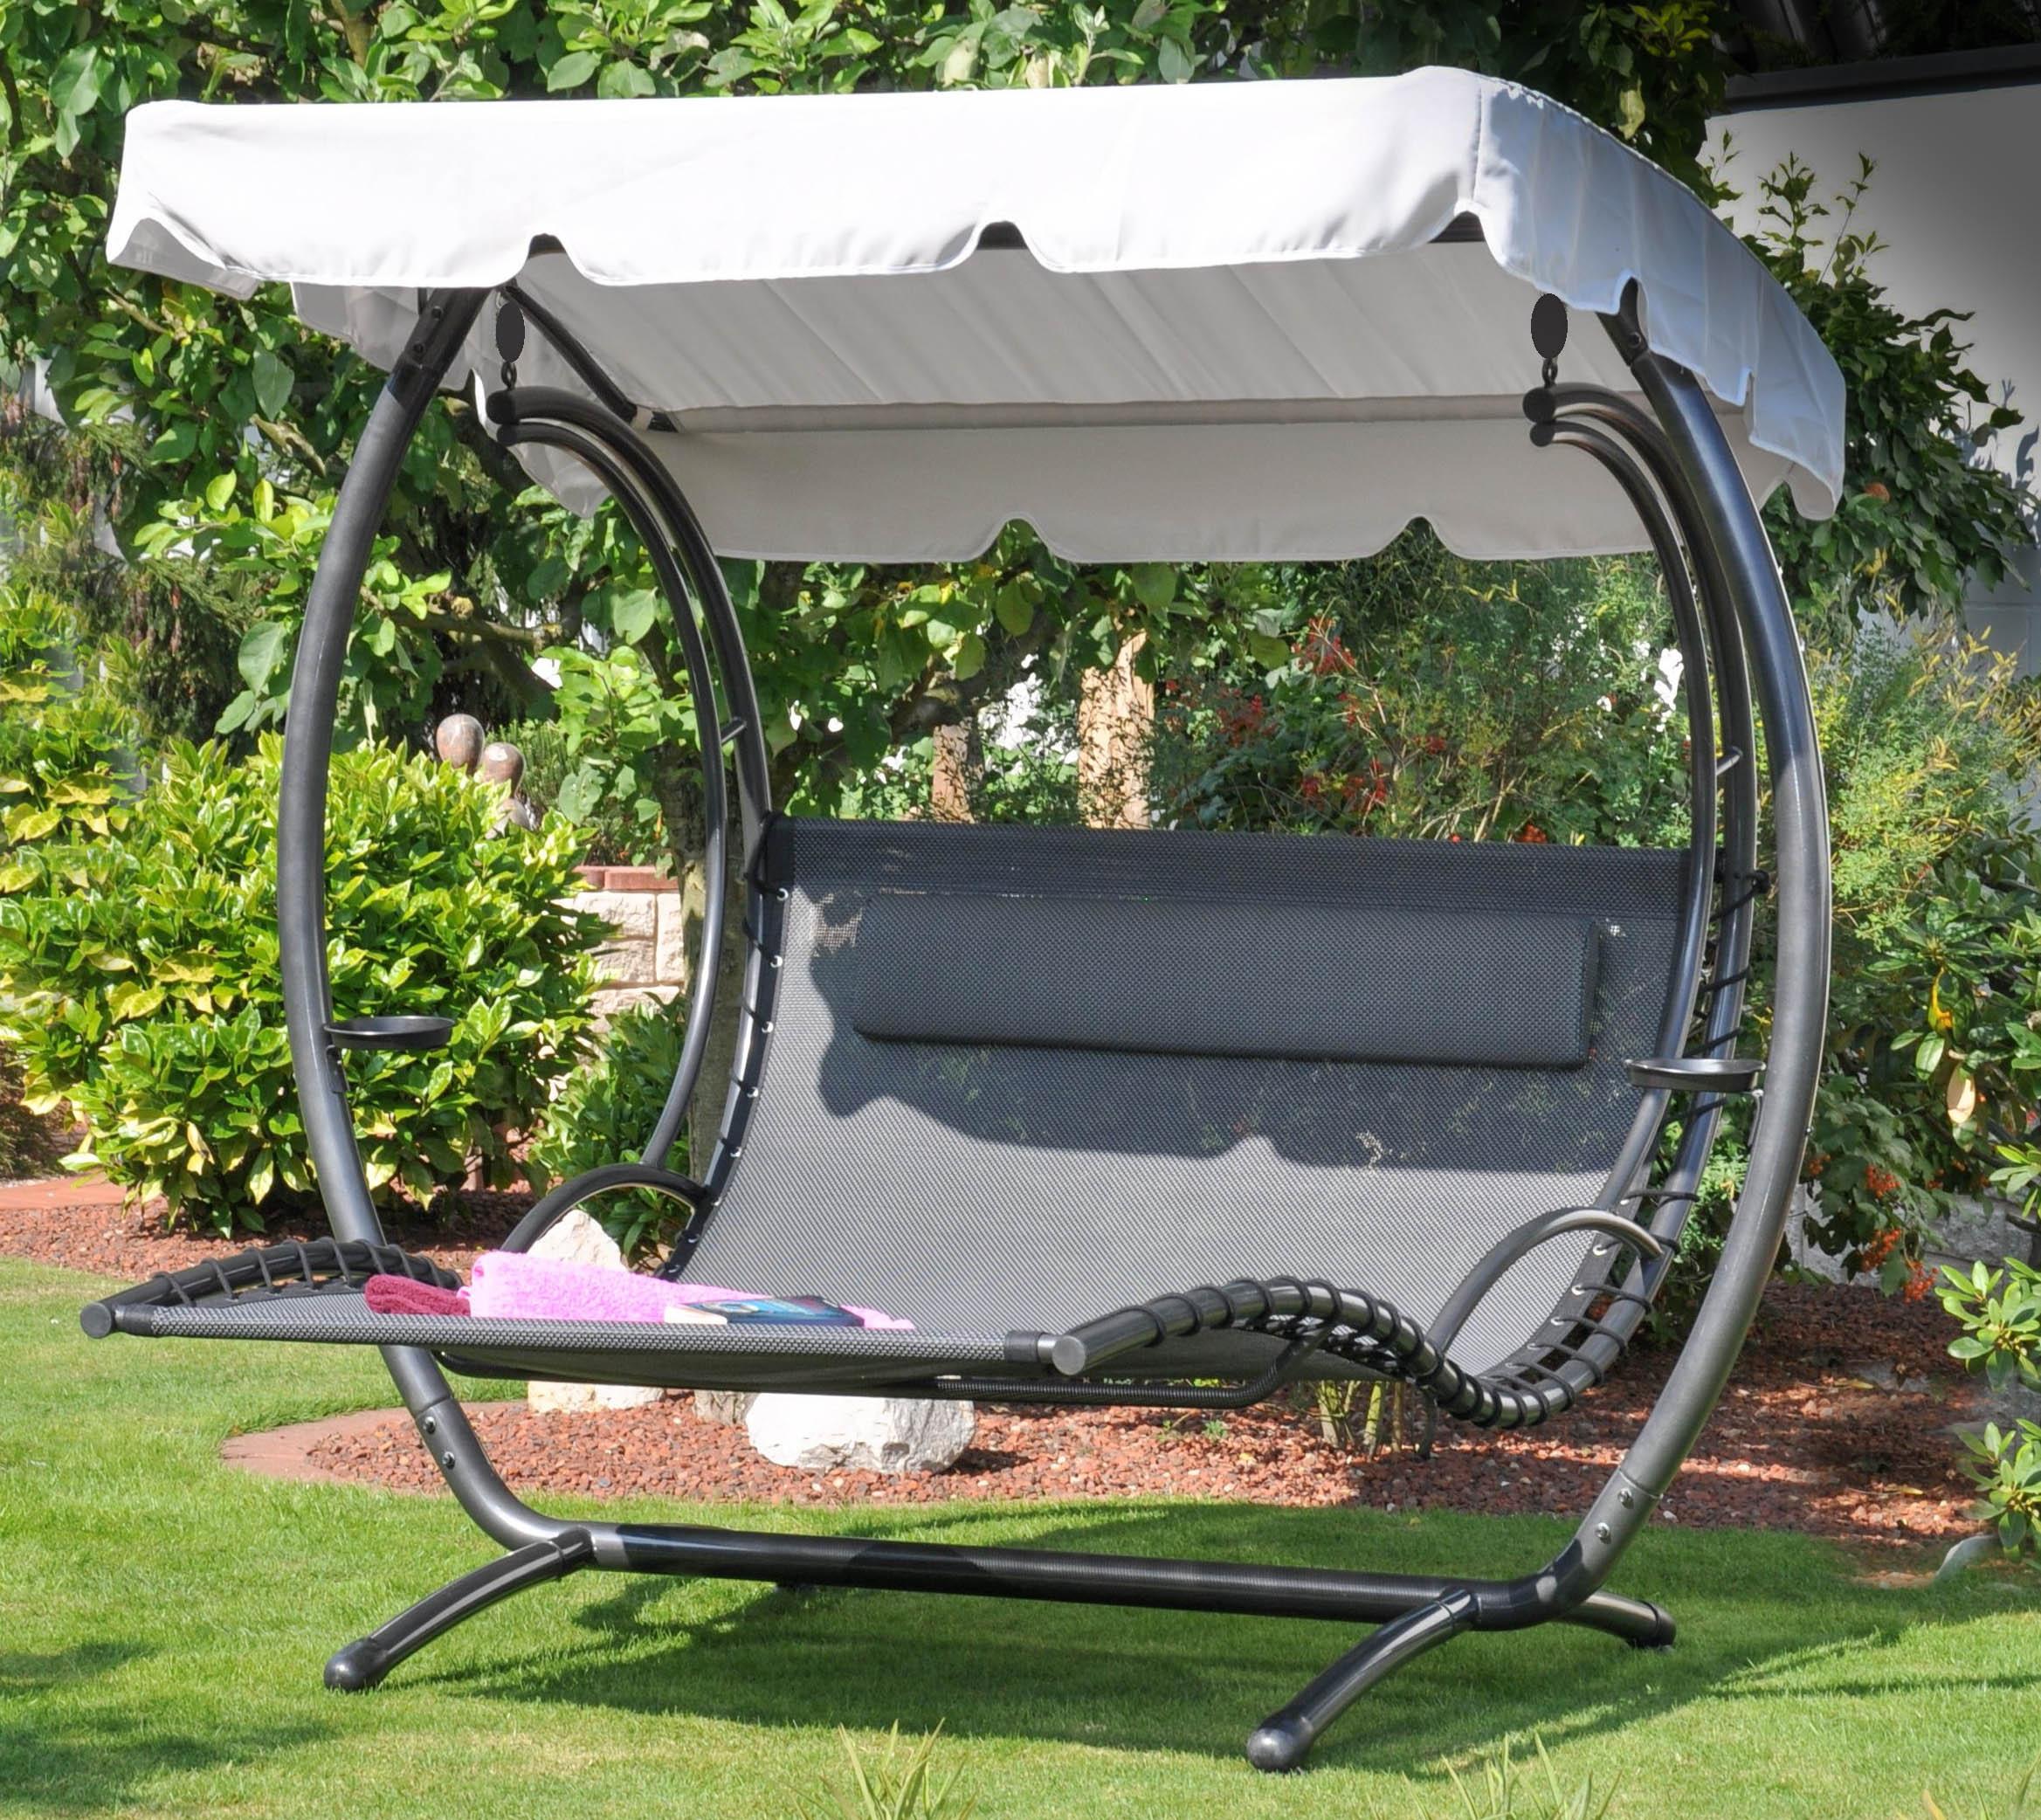 doppel schaukelliege capri duo swing gartenshop. Black Bedroom Furniture Sets. Home Design Ideas